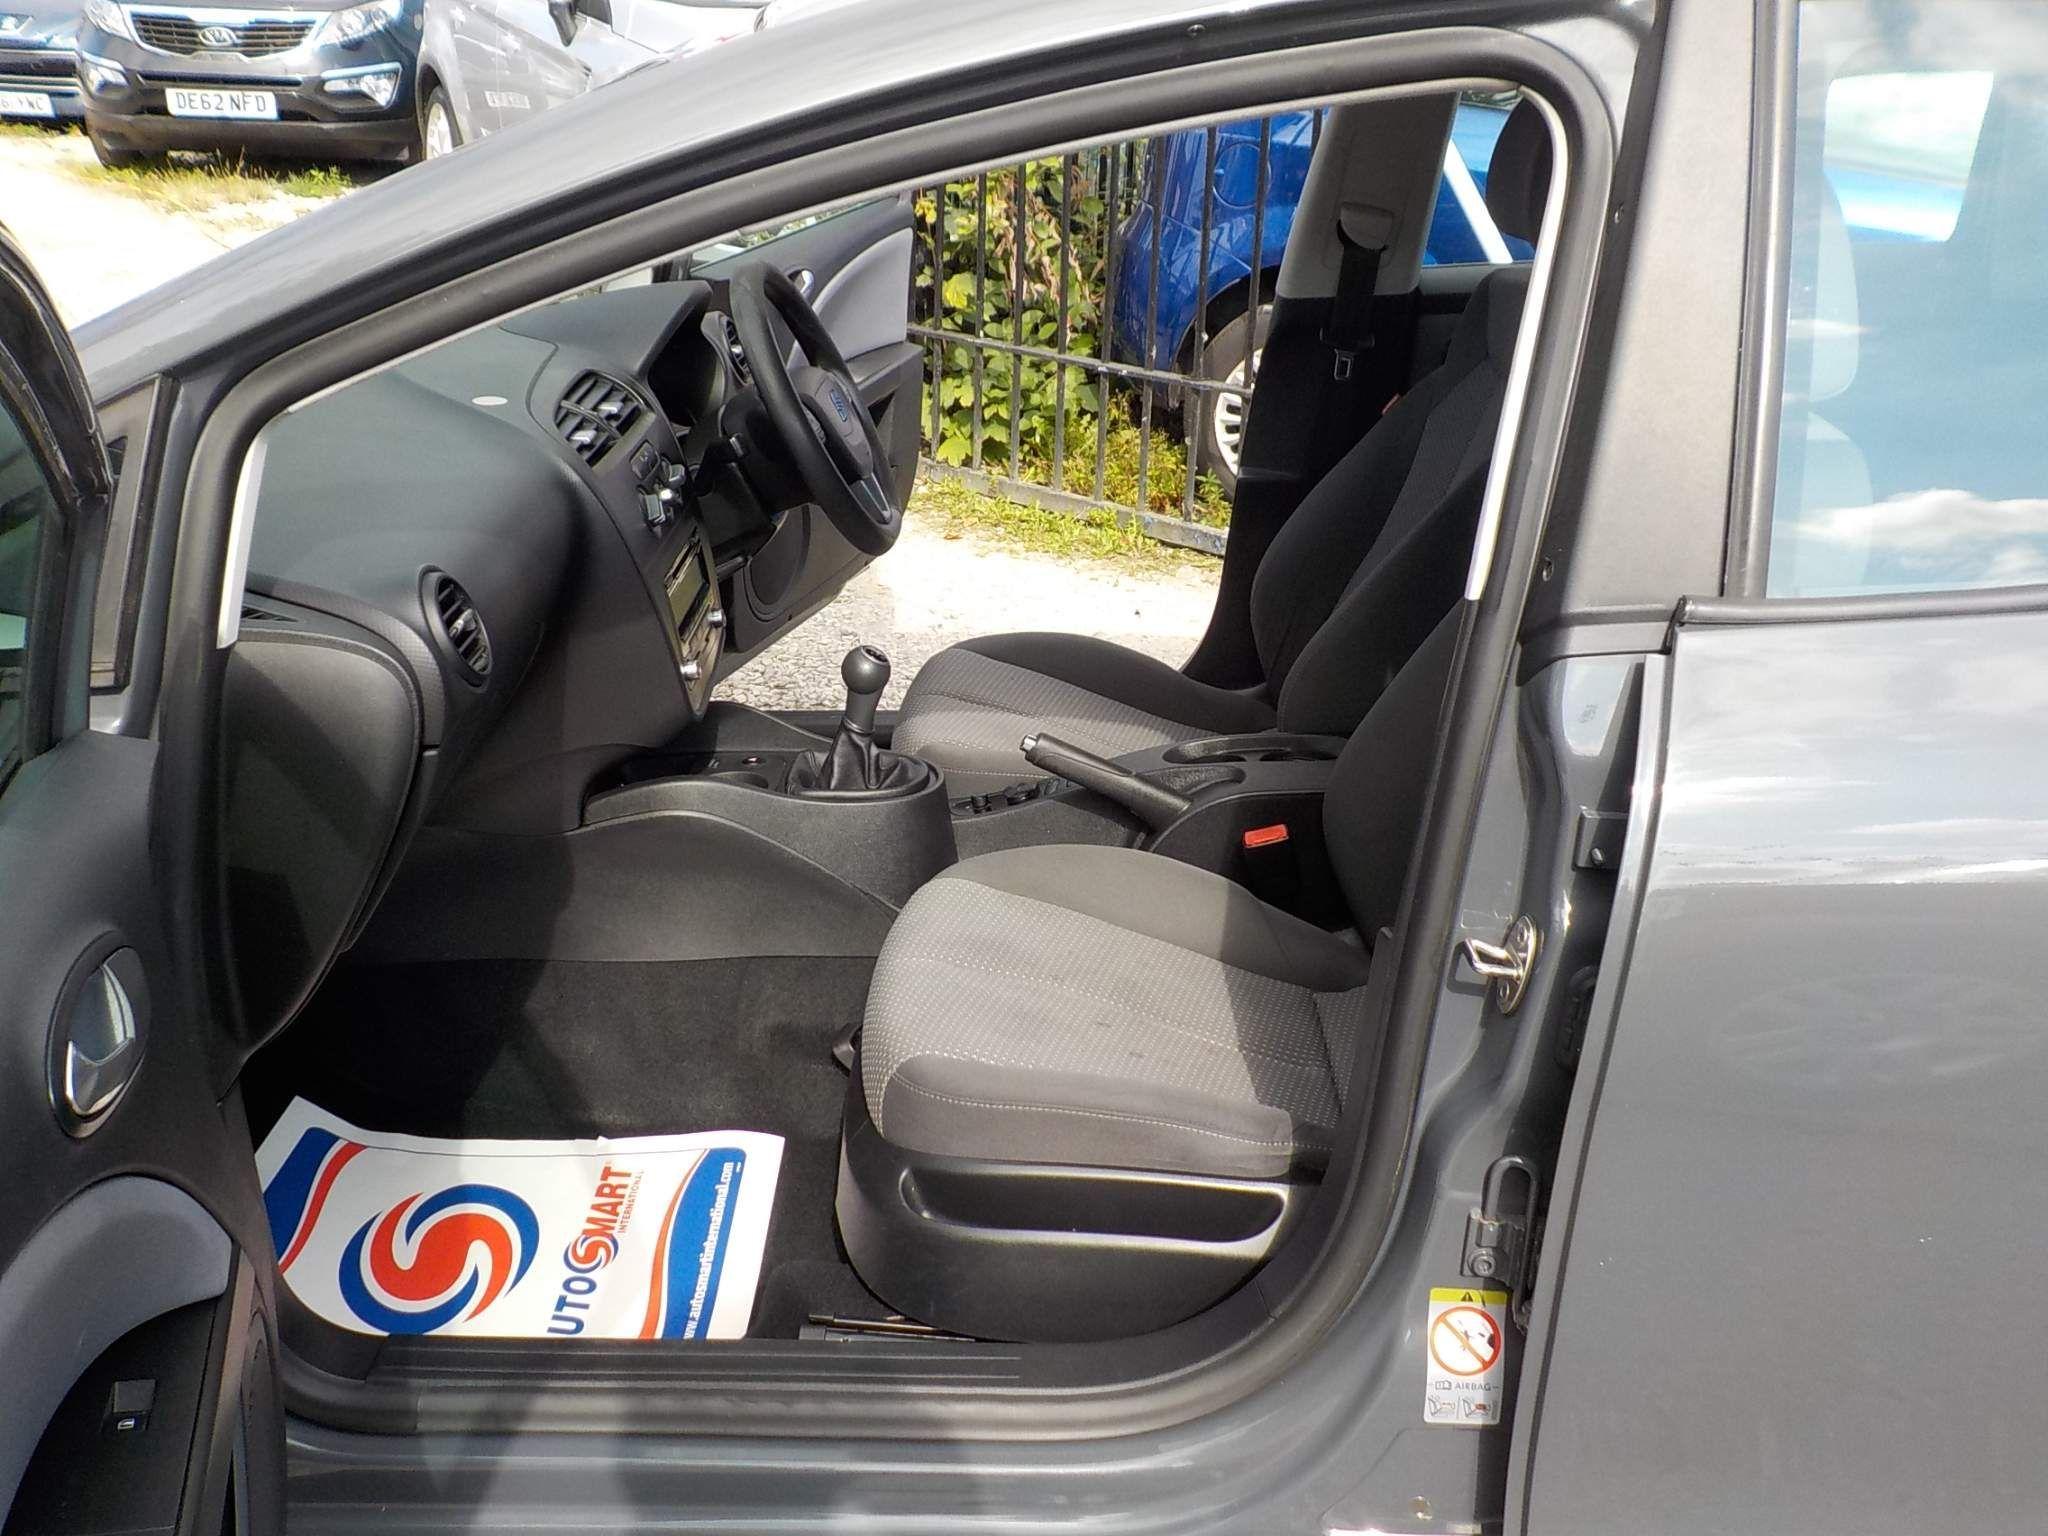 SEAT Leon 1.6 TDI CR S Emocion 5dr